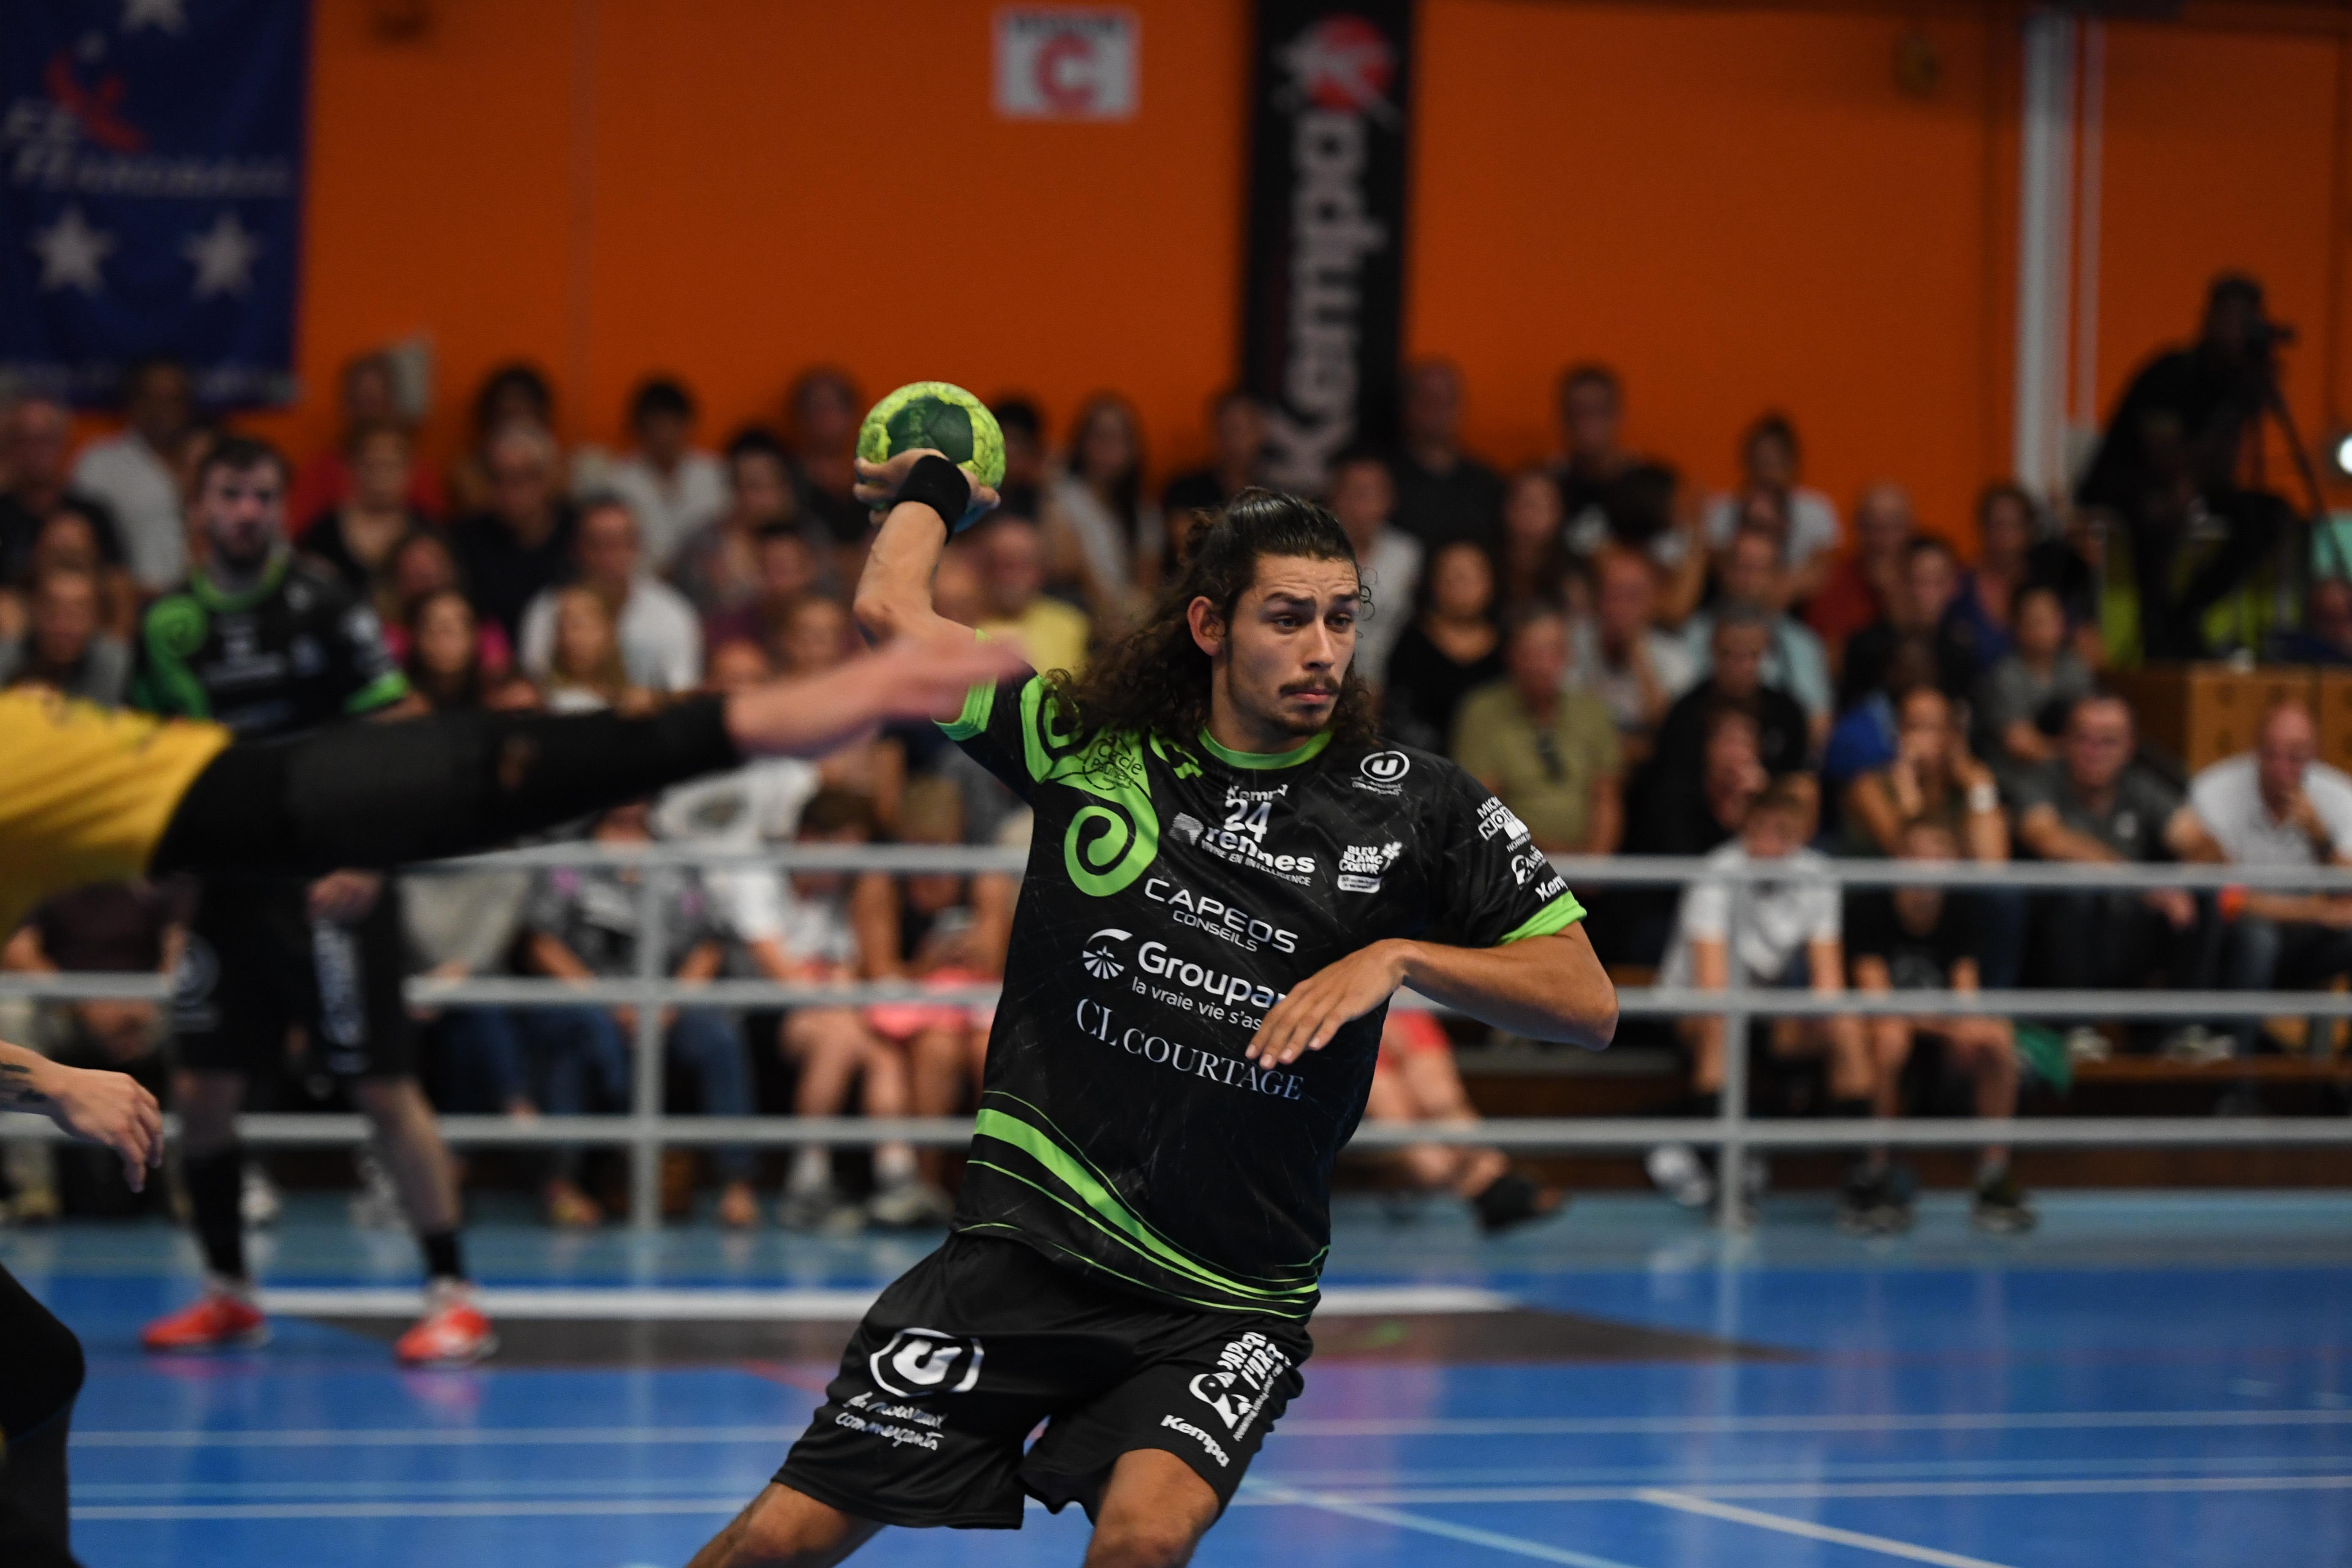 N1m, CPB Rennes Hazebrouck